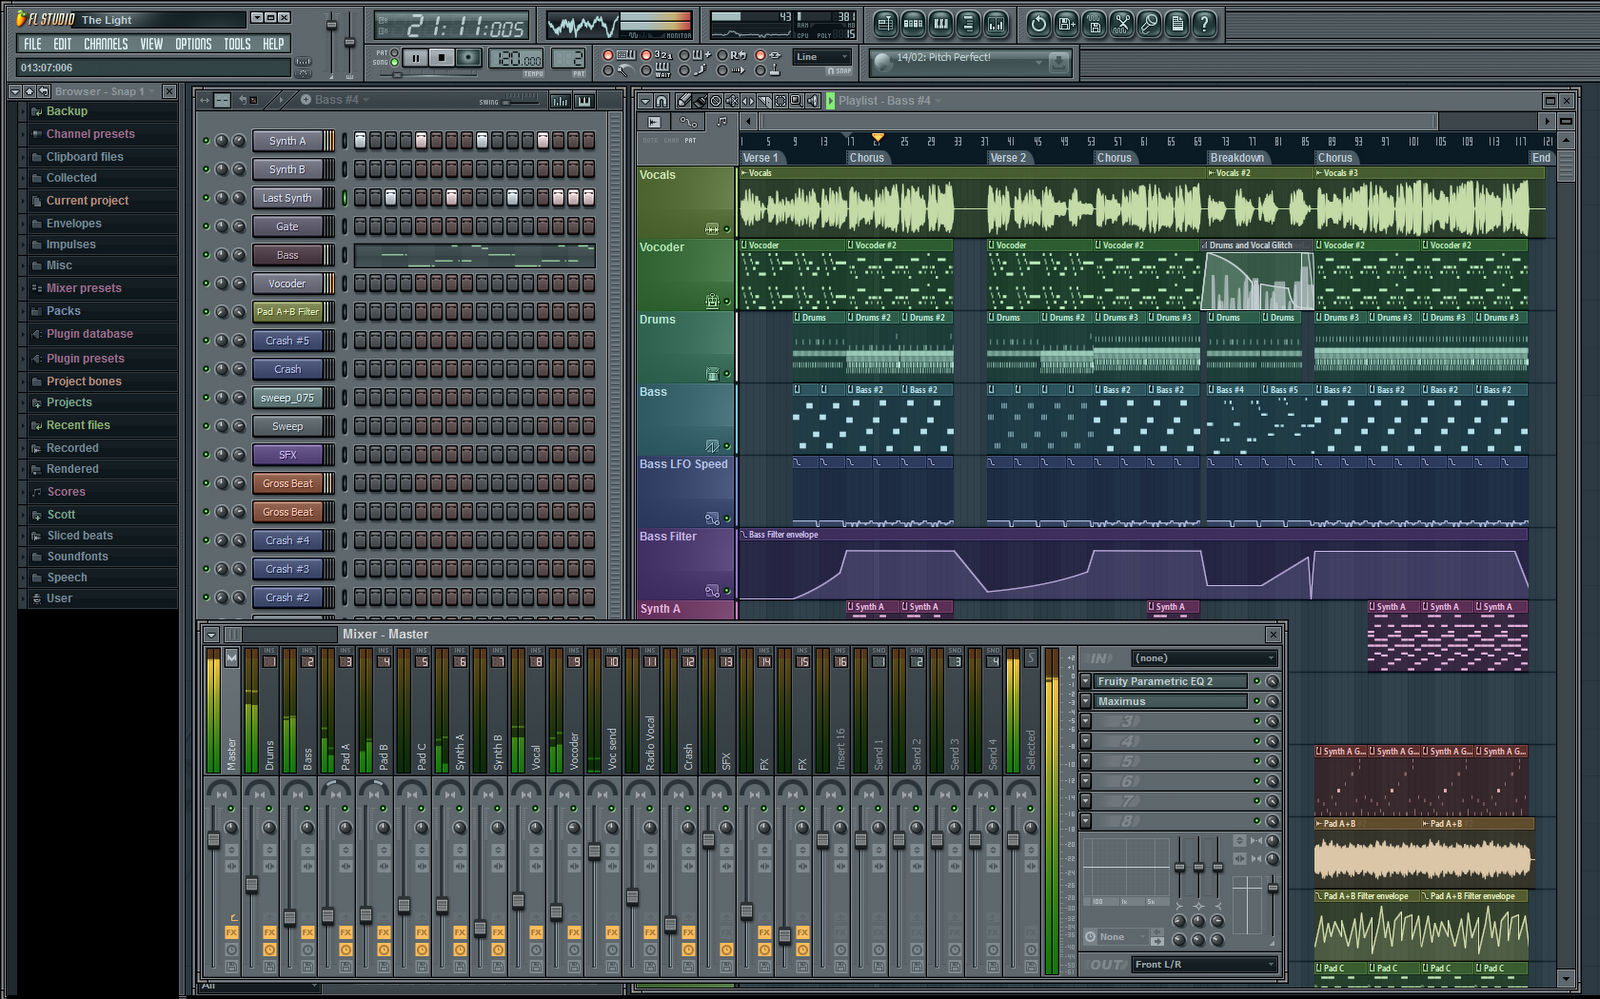 Fl studio 124 free. download full version cracked